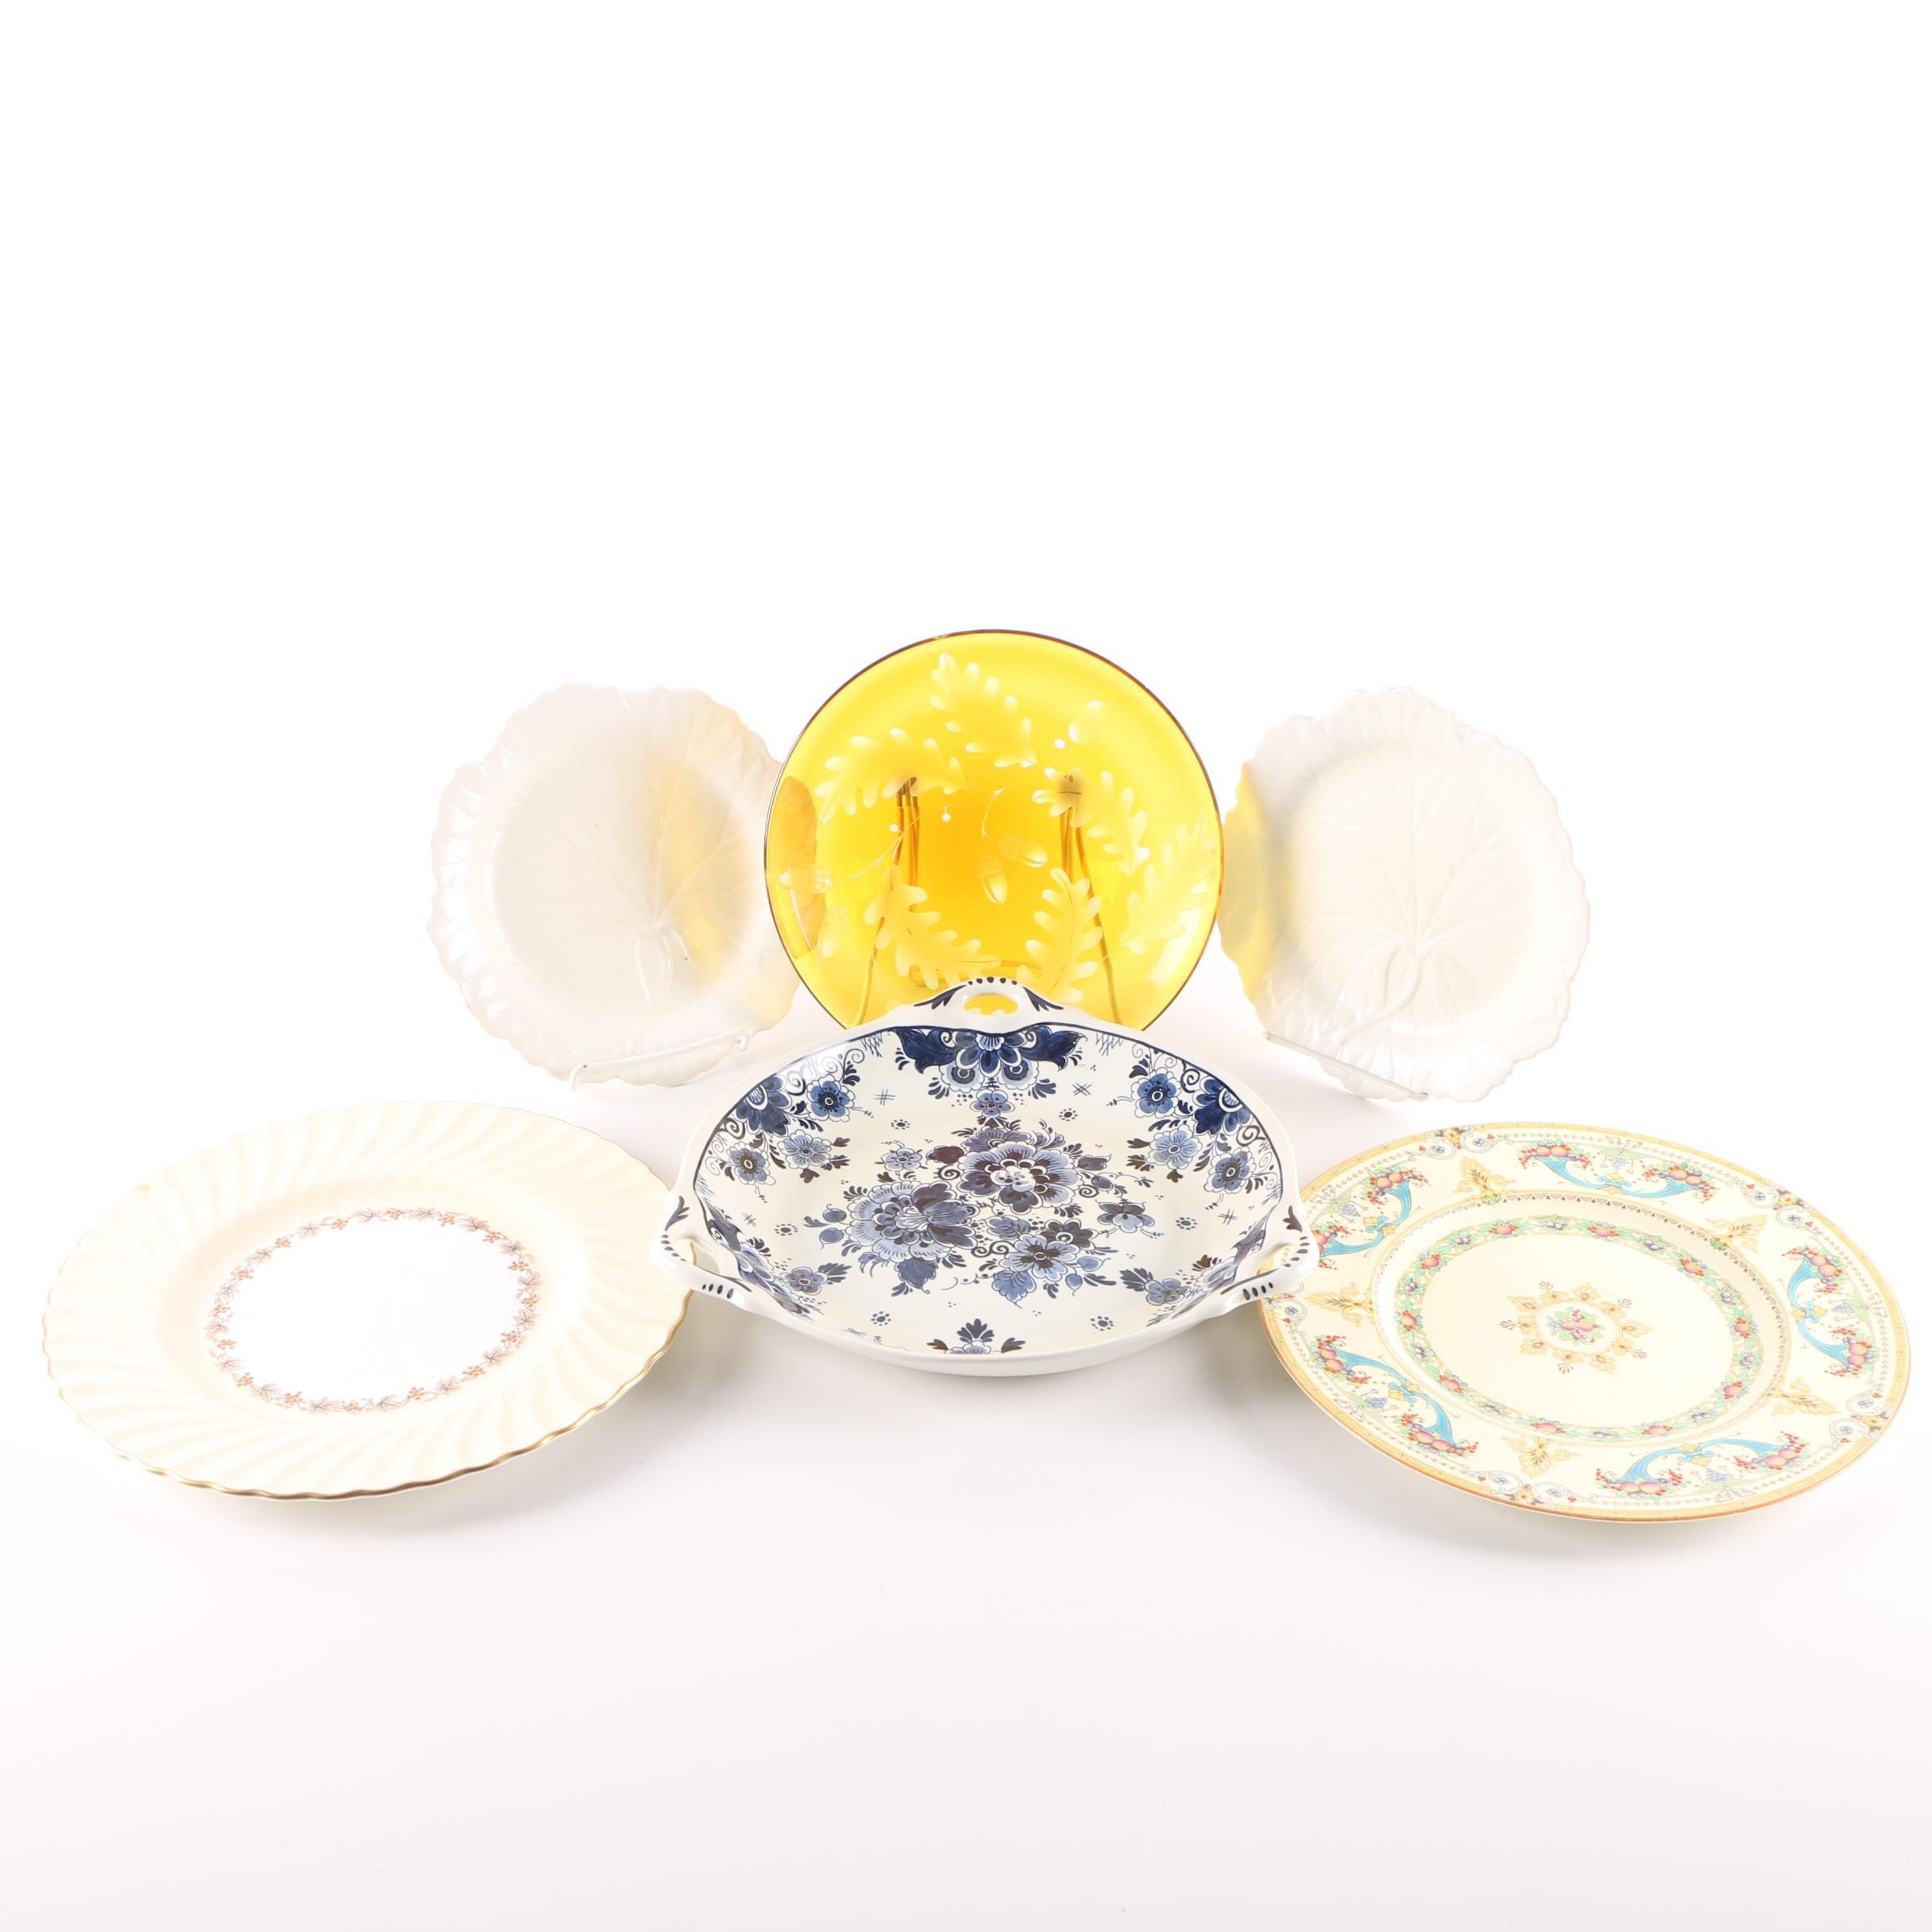 Ceramic and Glass Tableware Including Vintage Royal Worcester